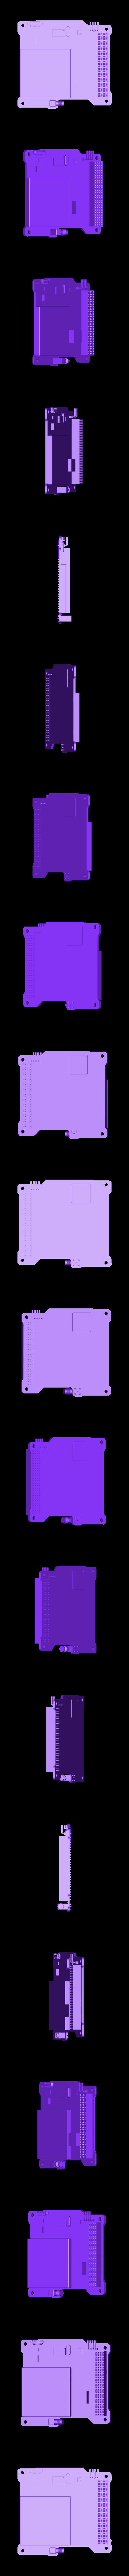 Transceiver.stl Download free STL file ArduSat • 3D printing template, Loustic3D888